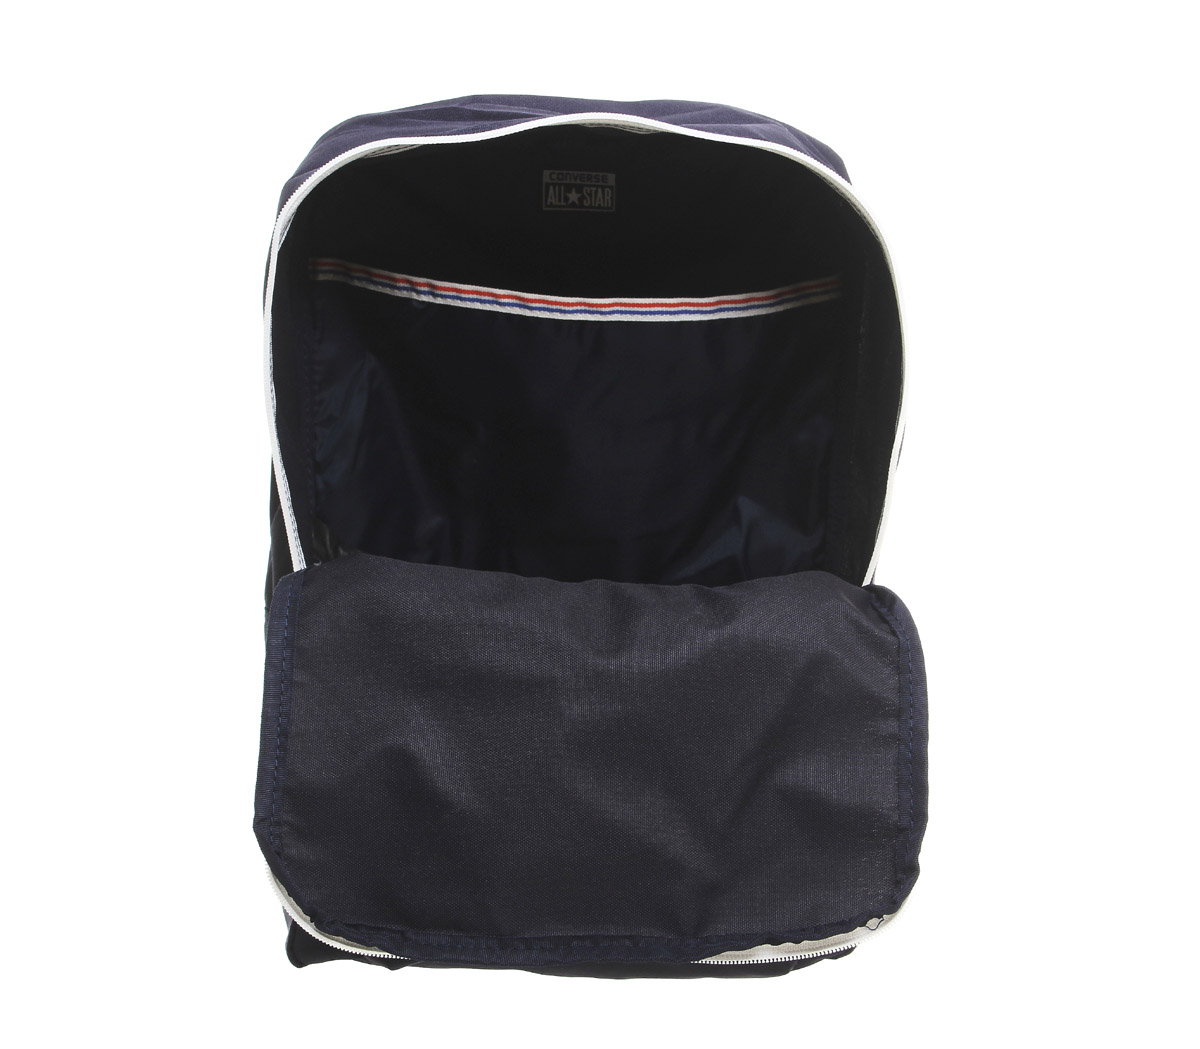 4cac25da9d0b Accessories Converse Horizontal Zip Back Pack Navy Nylon Accessories ...